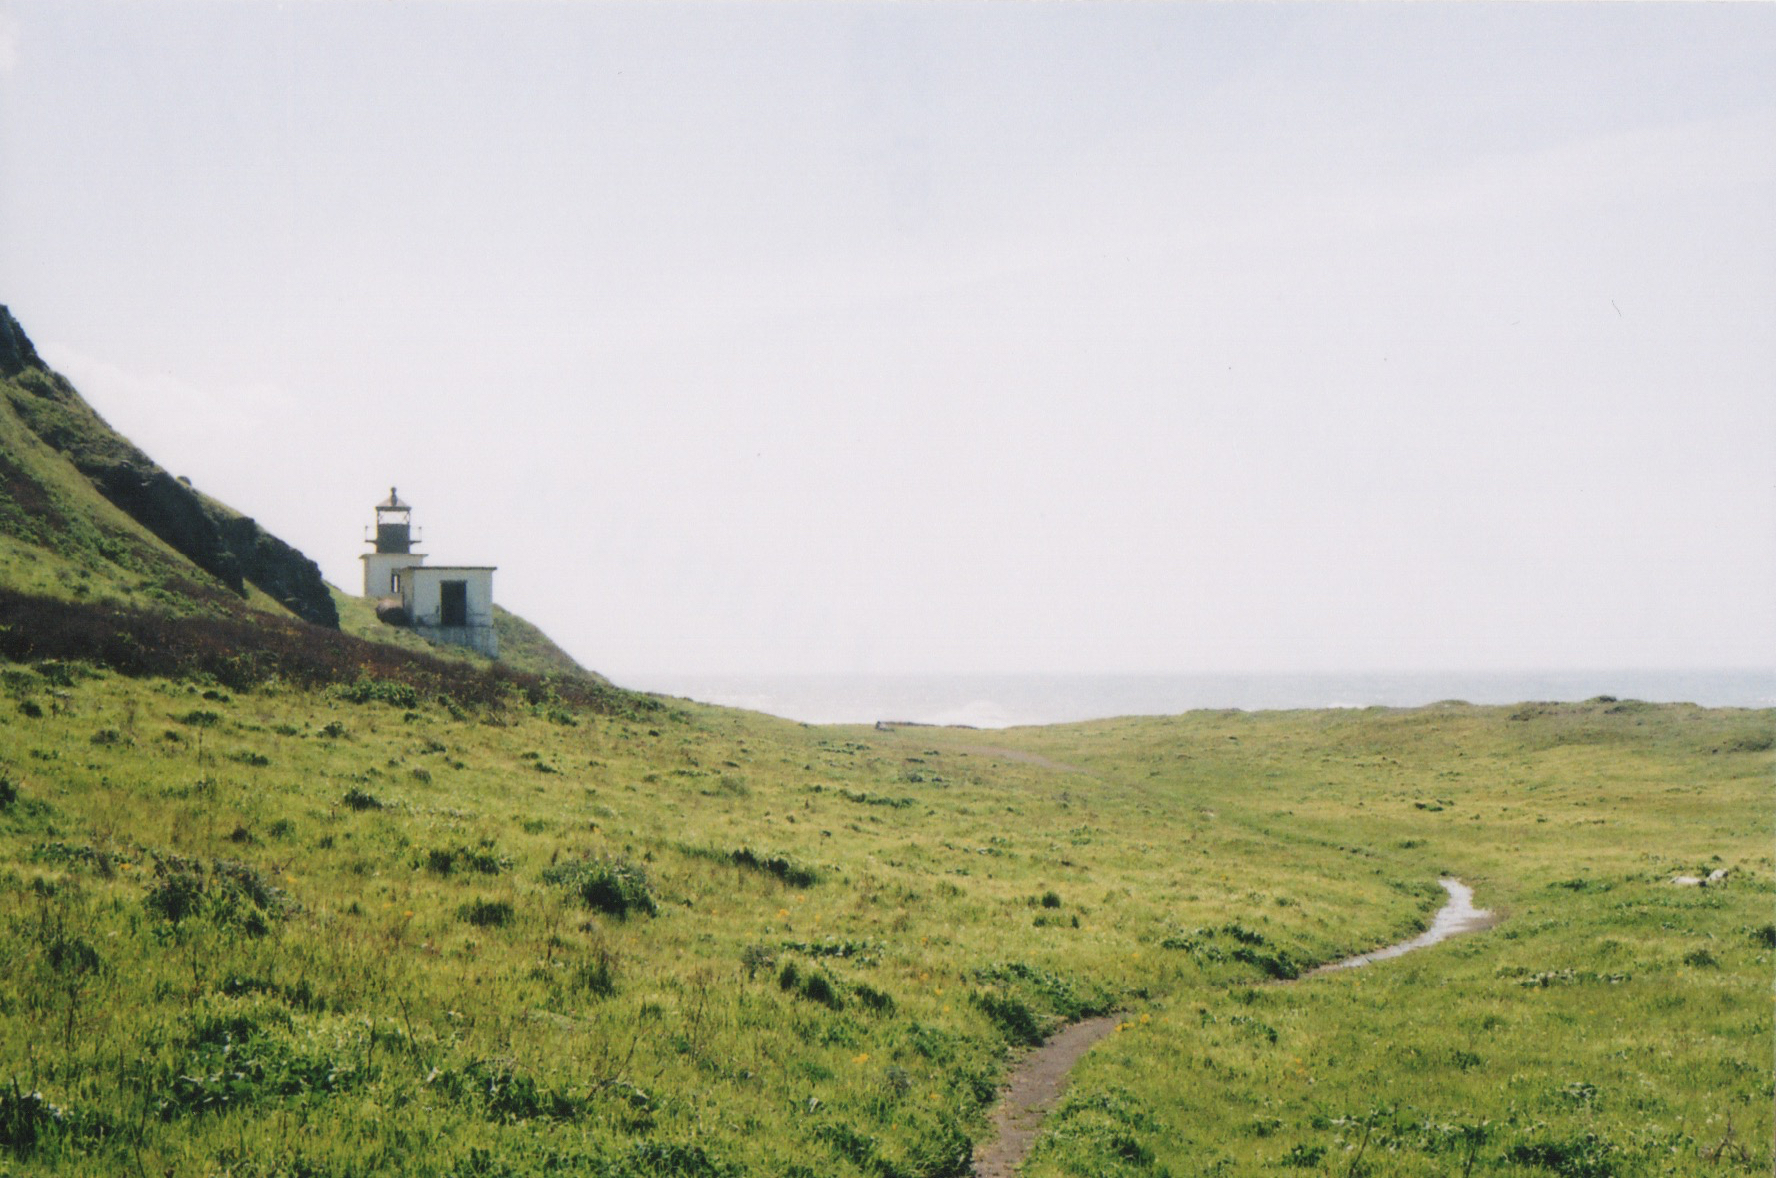 Lighthouse  | Joseph Braun | 2017 | 35mm